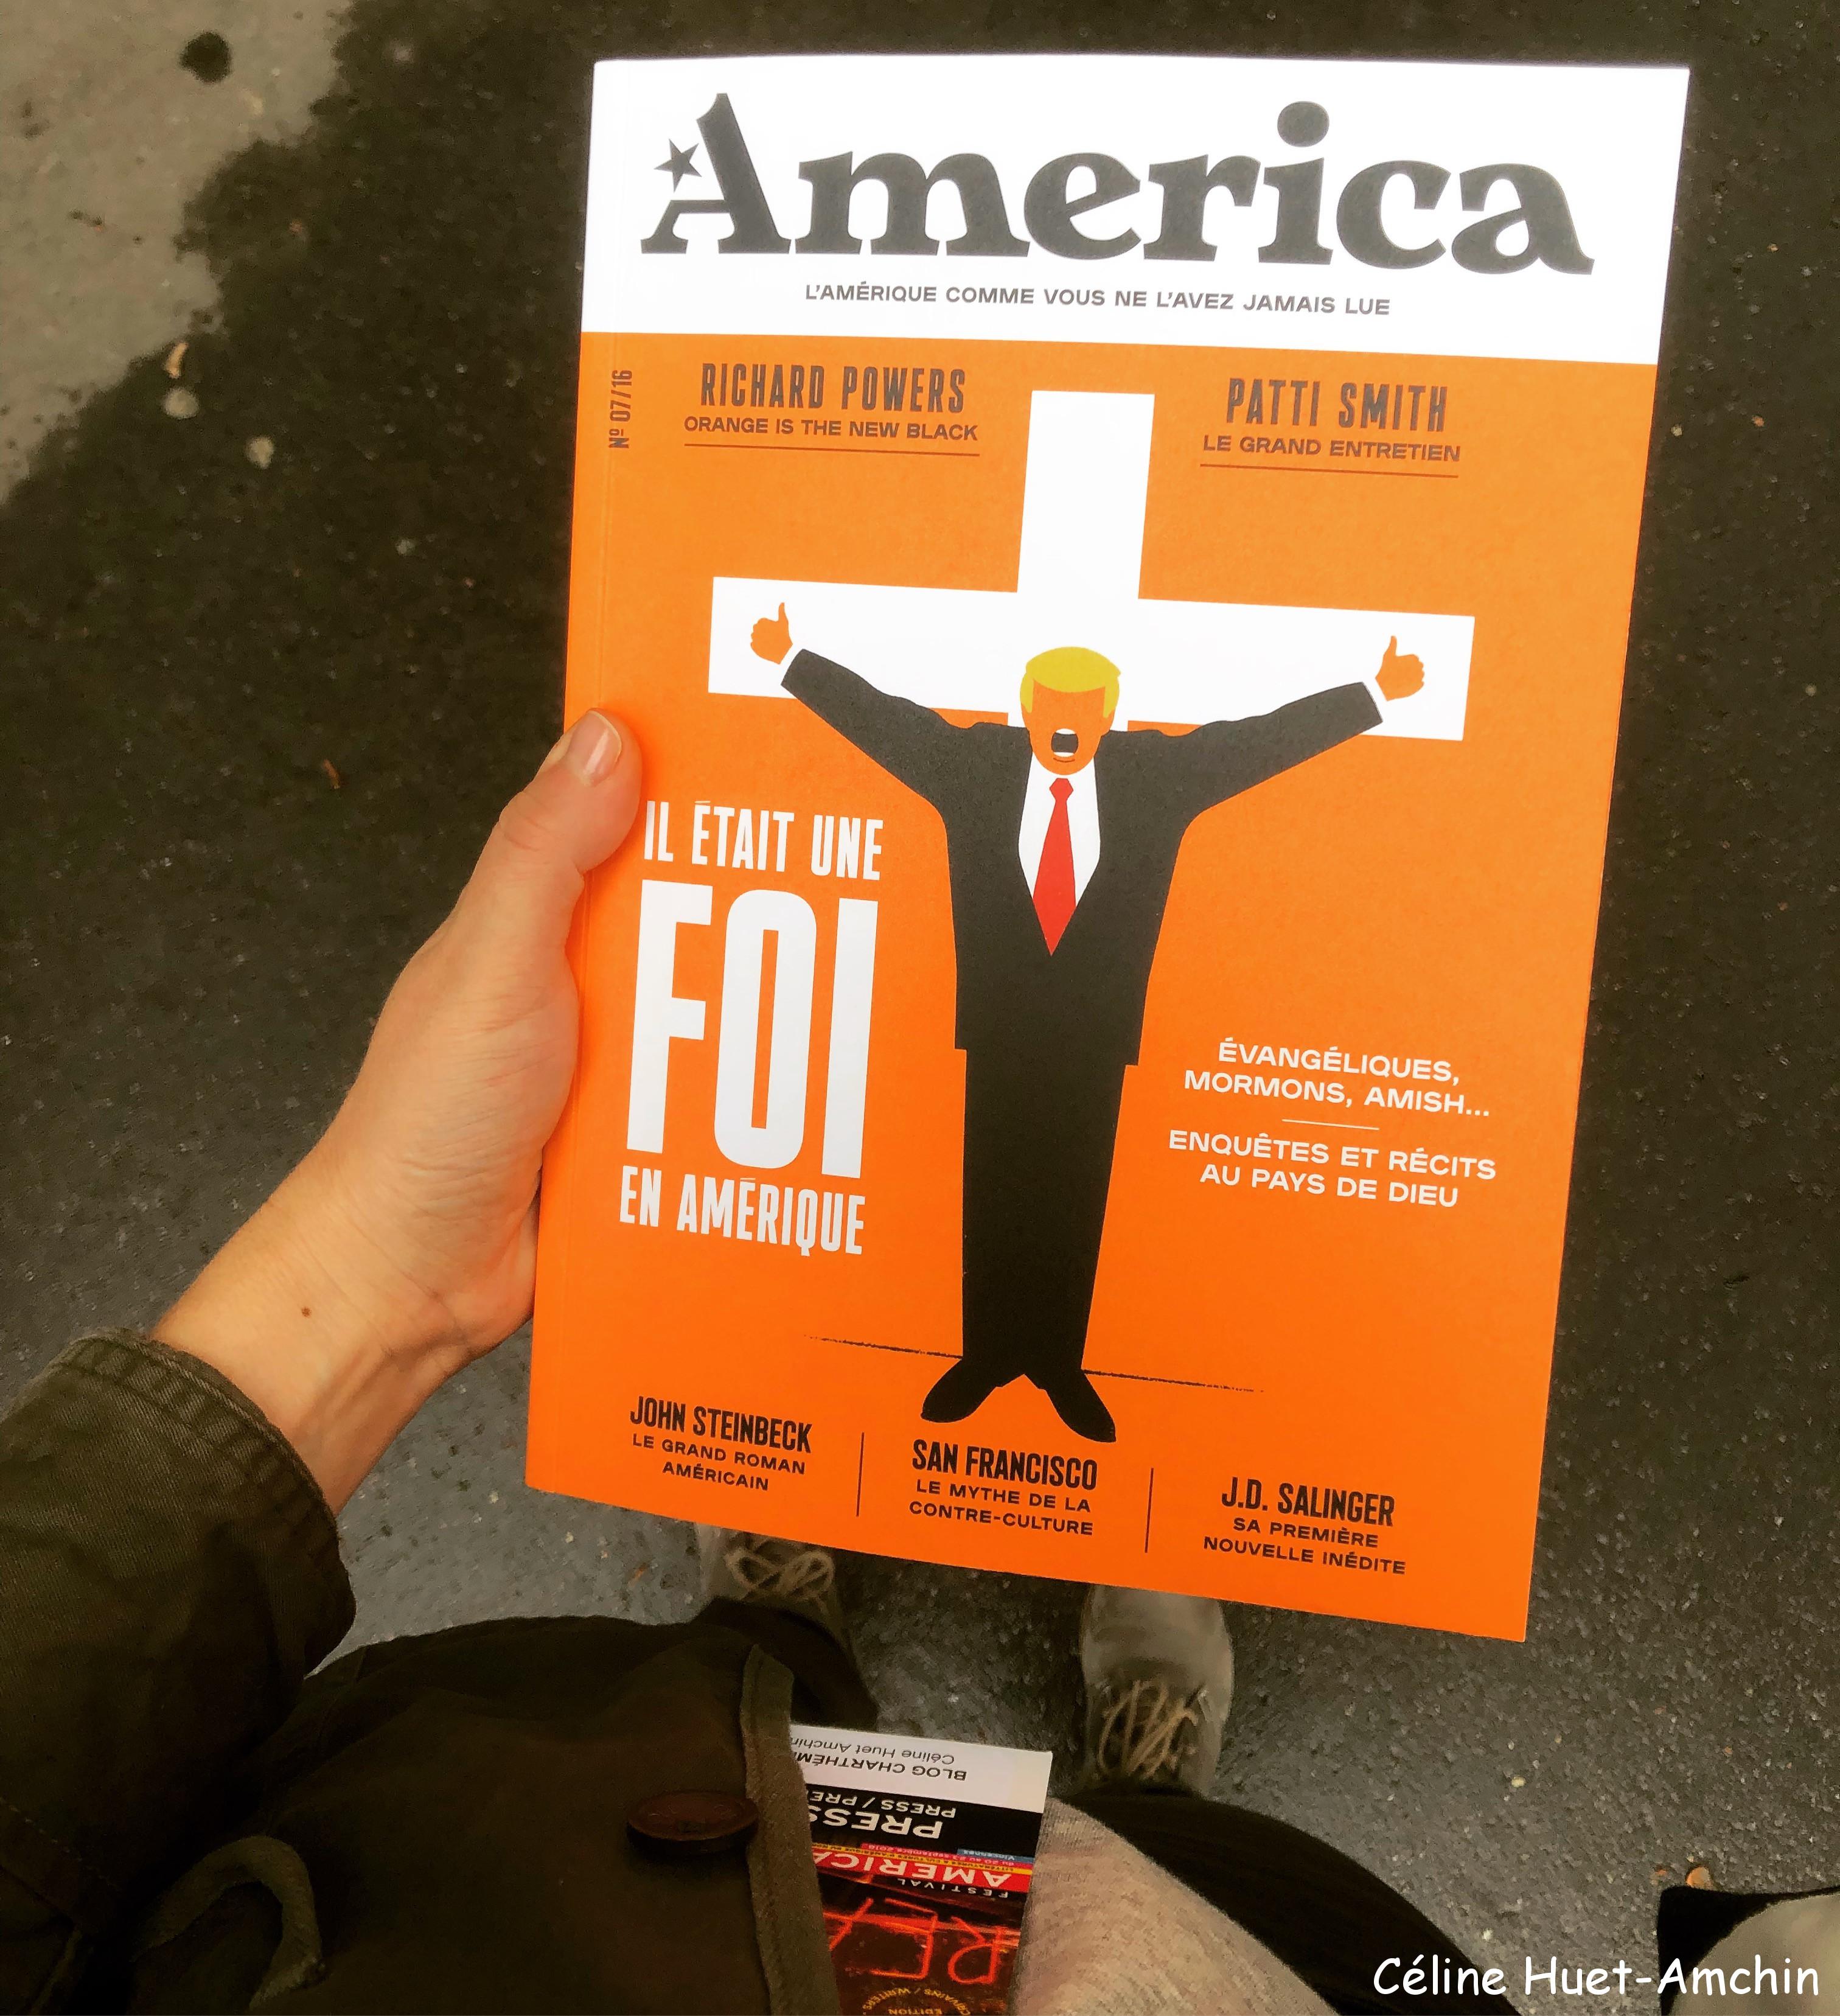 America Busnel Fottorino n° 7/16